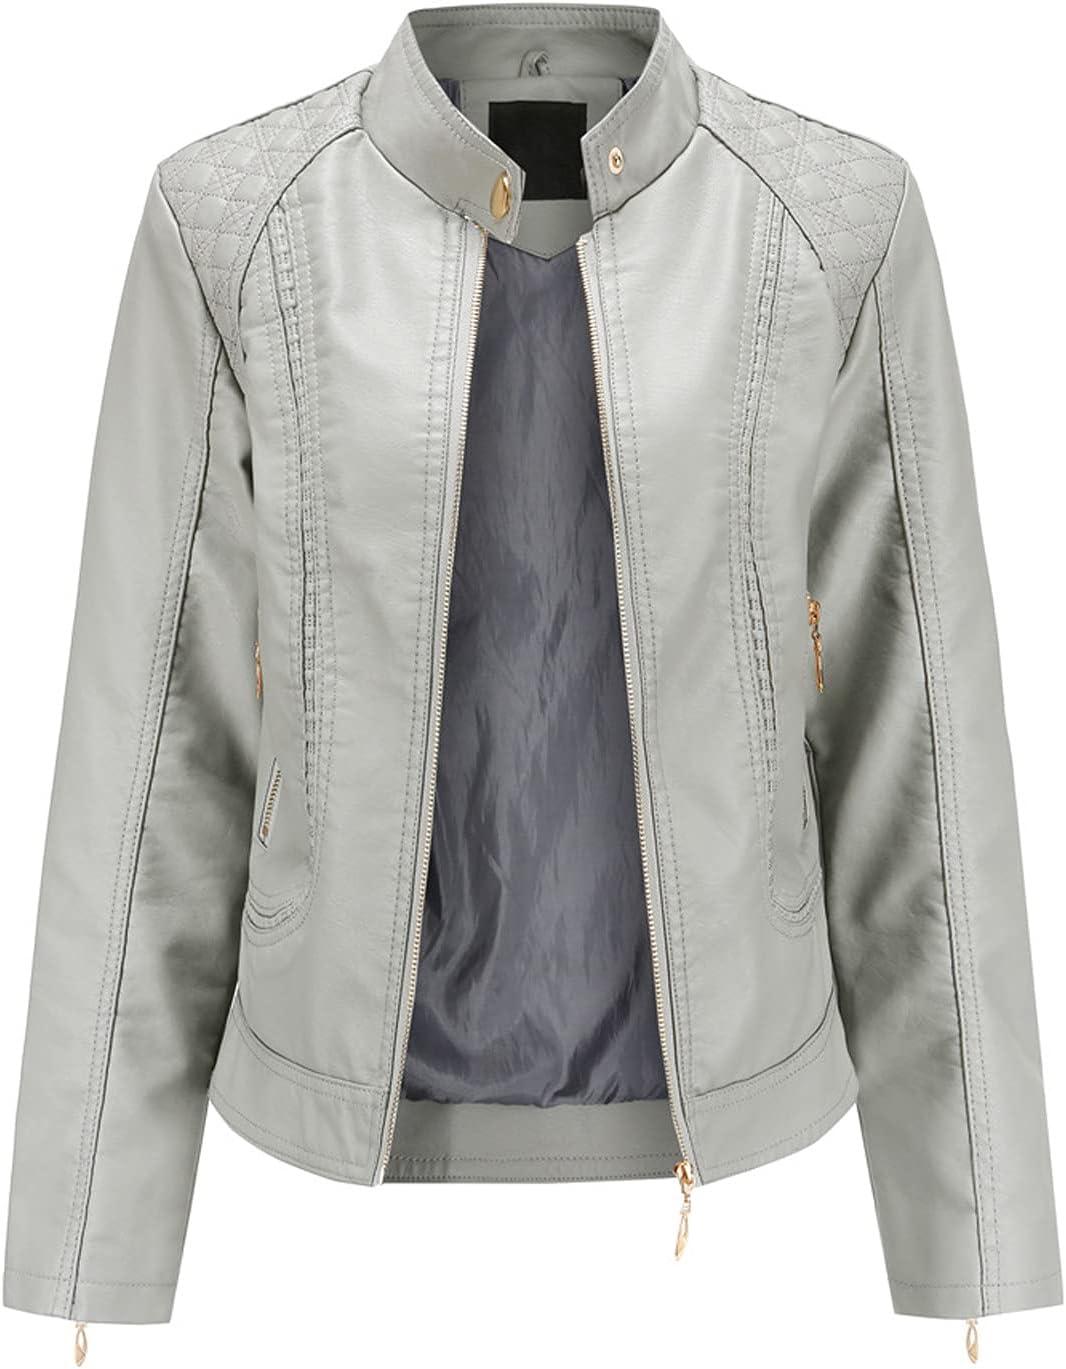 Women's Jacket,Ladies Fashion Solid Color Slim Stand Collar Zipper Solid Color Pocket Leather Biker Jacket